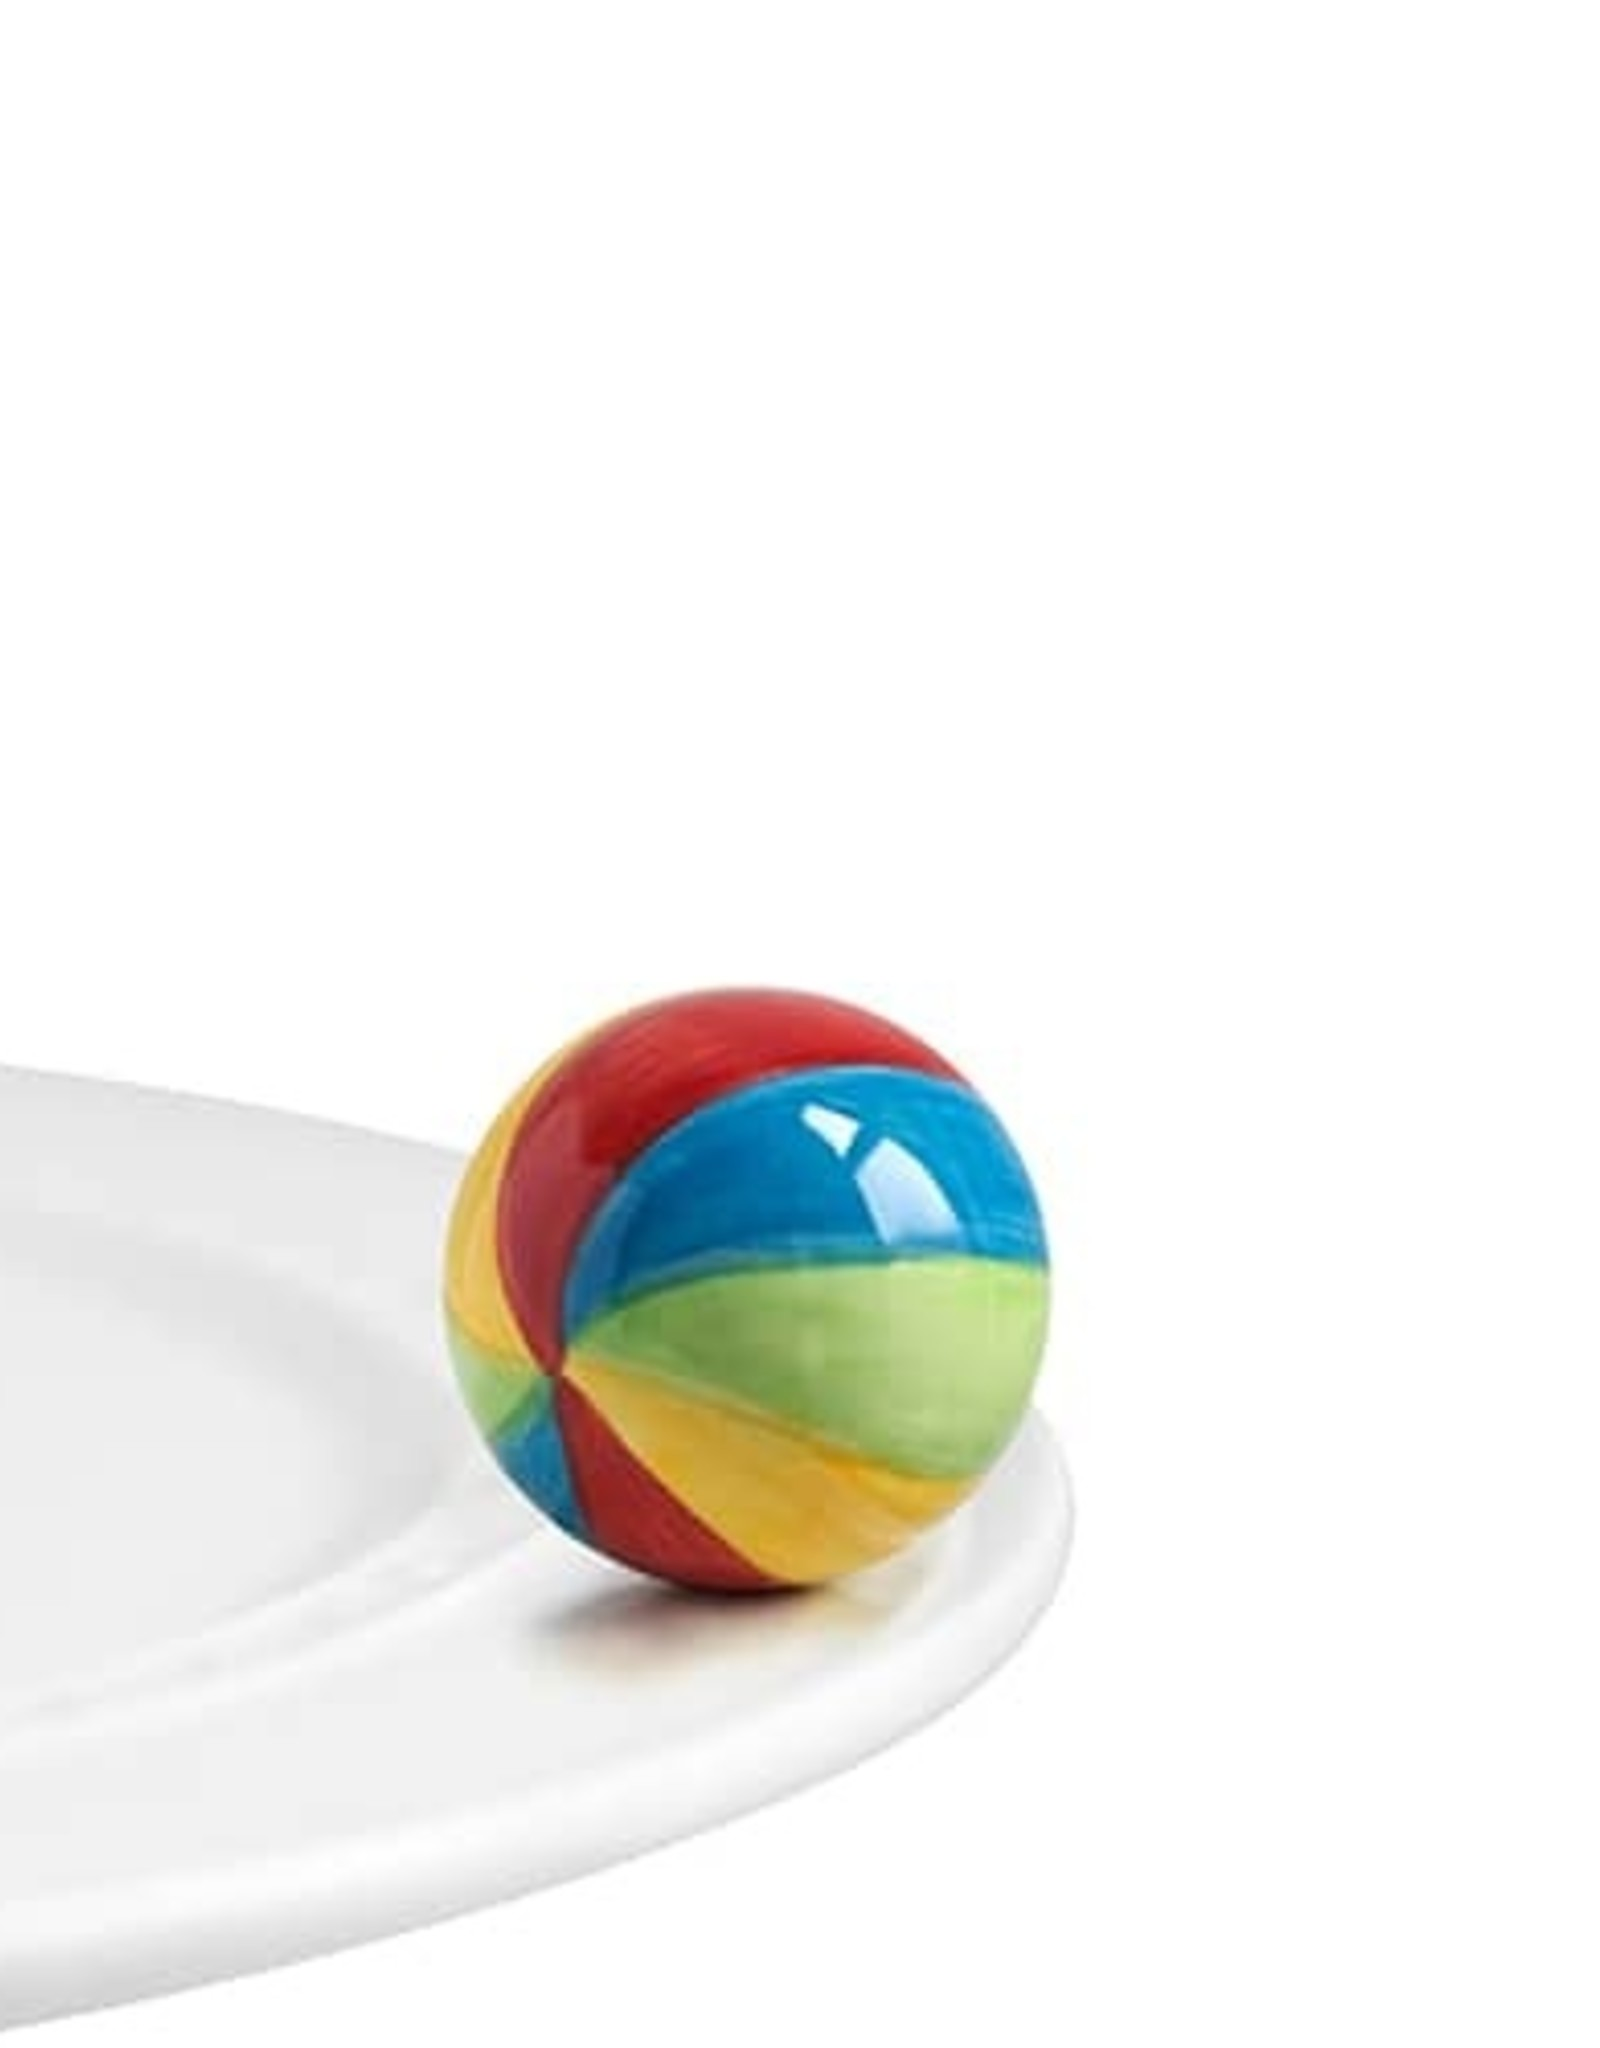 Nora Fleming have a ball (beach ball)